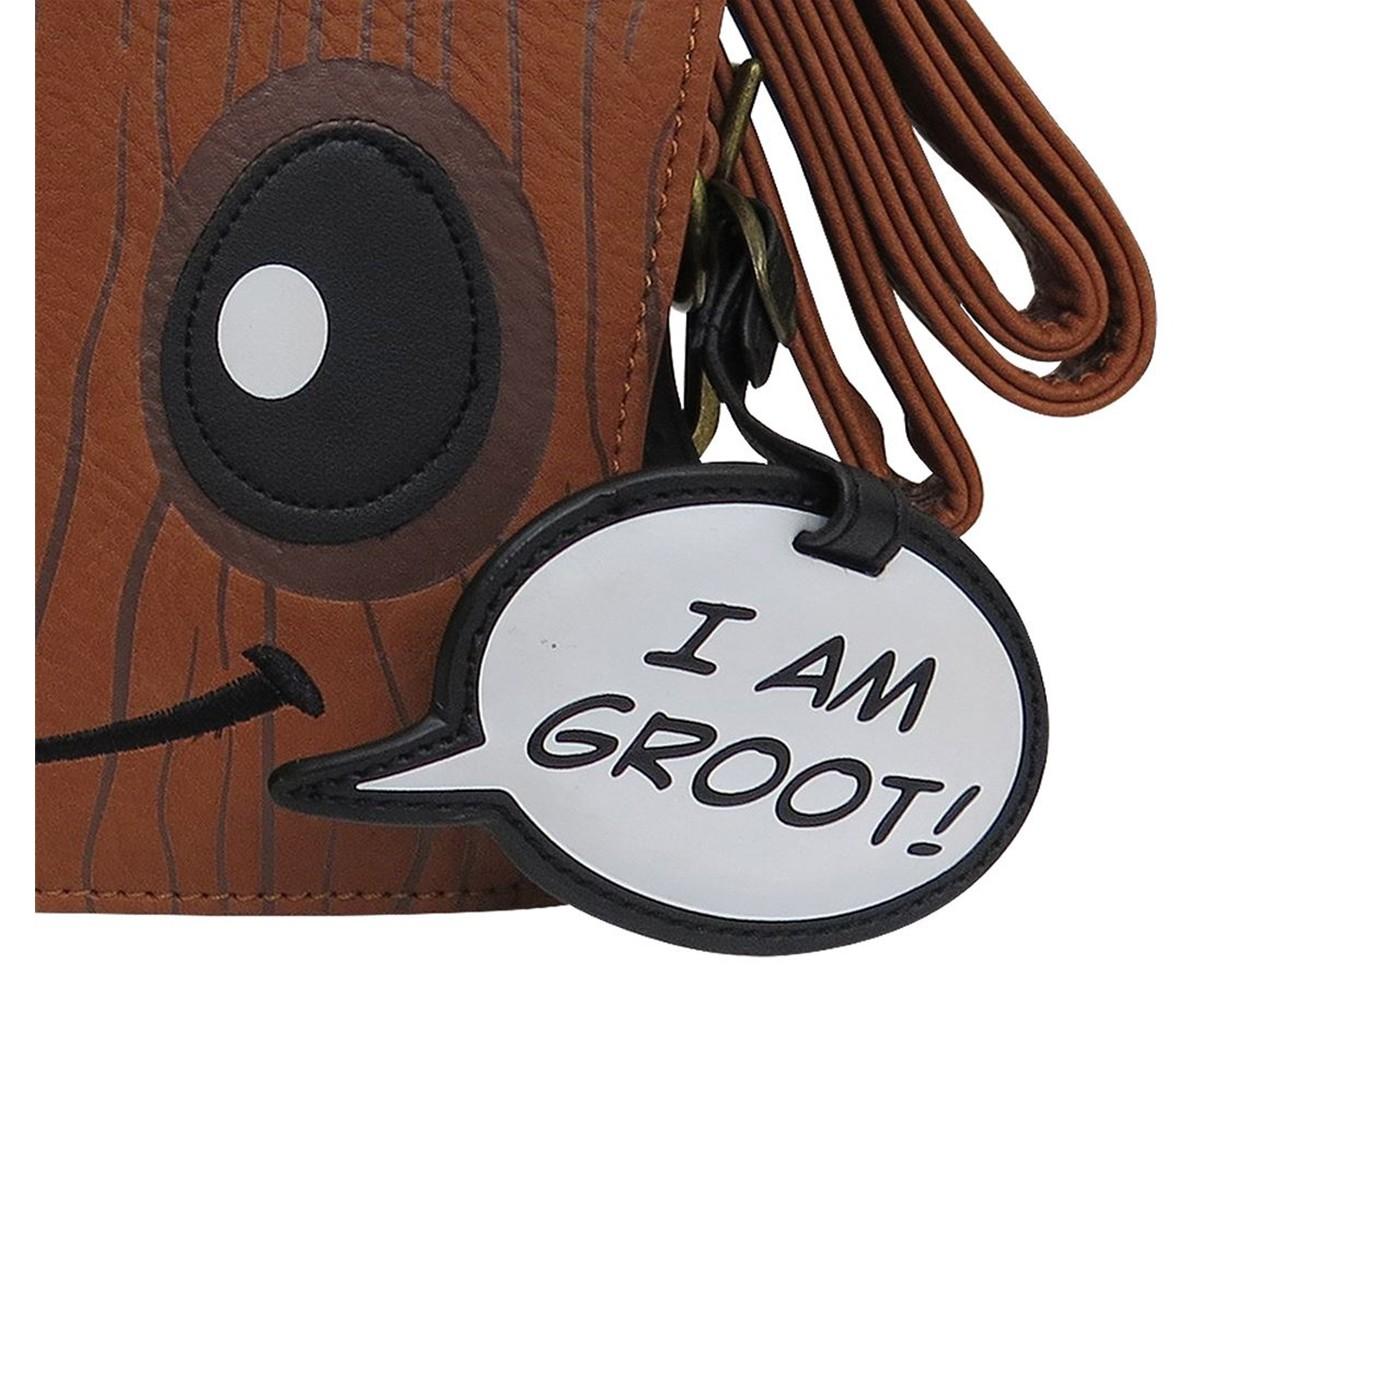 GOTG Groot Loungefly Crossbody Handbag with Charm